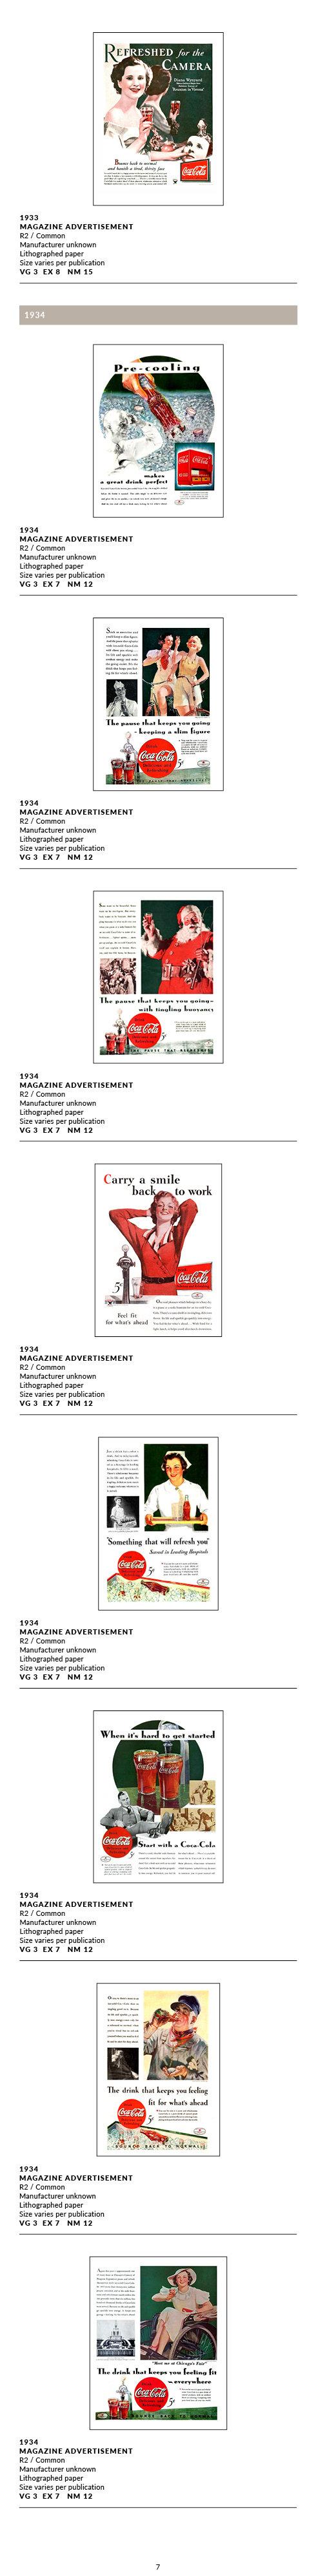 1930-34 Ads7.jpg